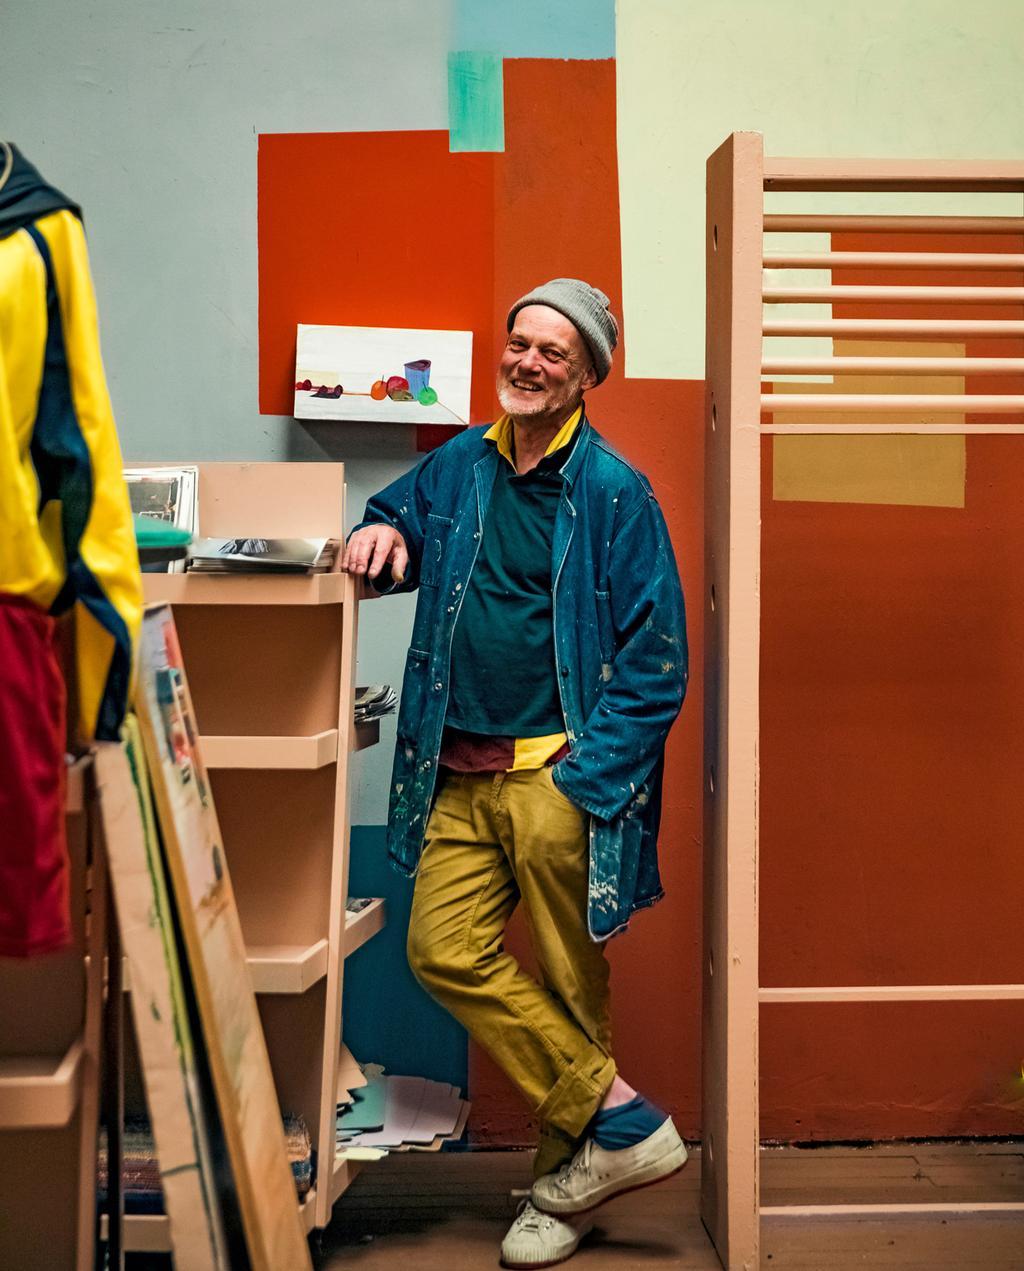 vtwonen 10-2019 | Ambacht Frank atelier portret